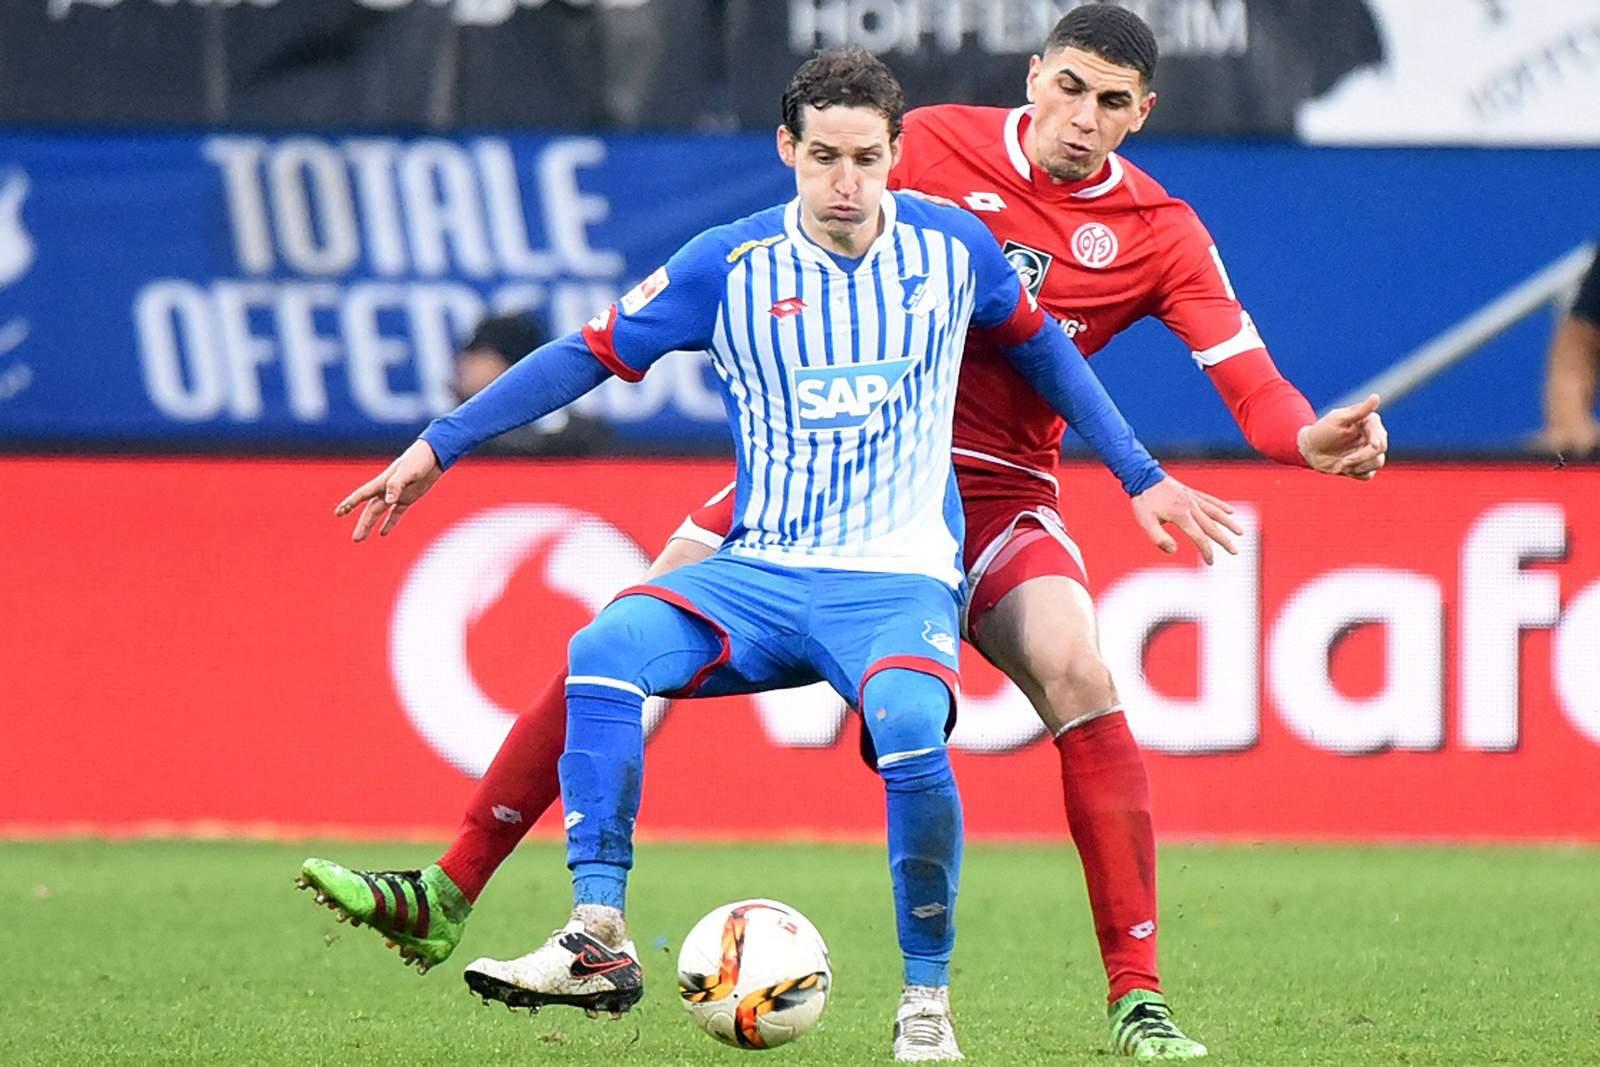 Setzt sich Rudy gegen Balogun durch? Unser Tipp: Hoffenheim gewinnt nicht gegen Mainz 05